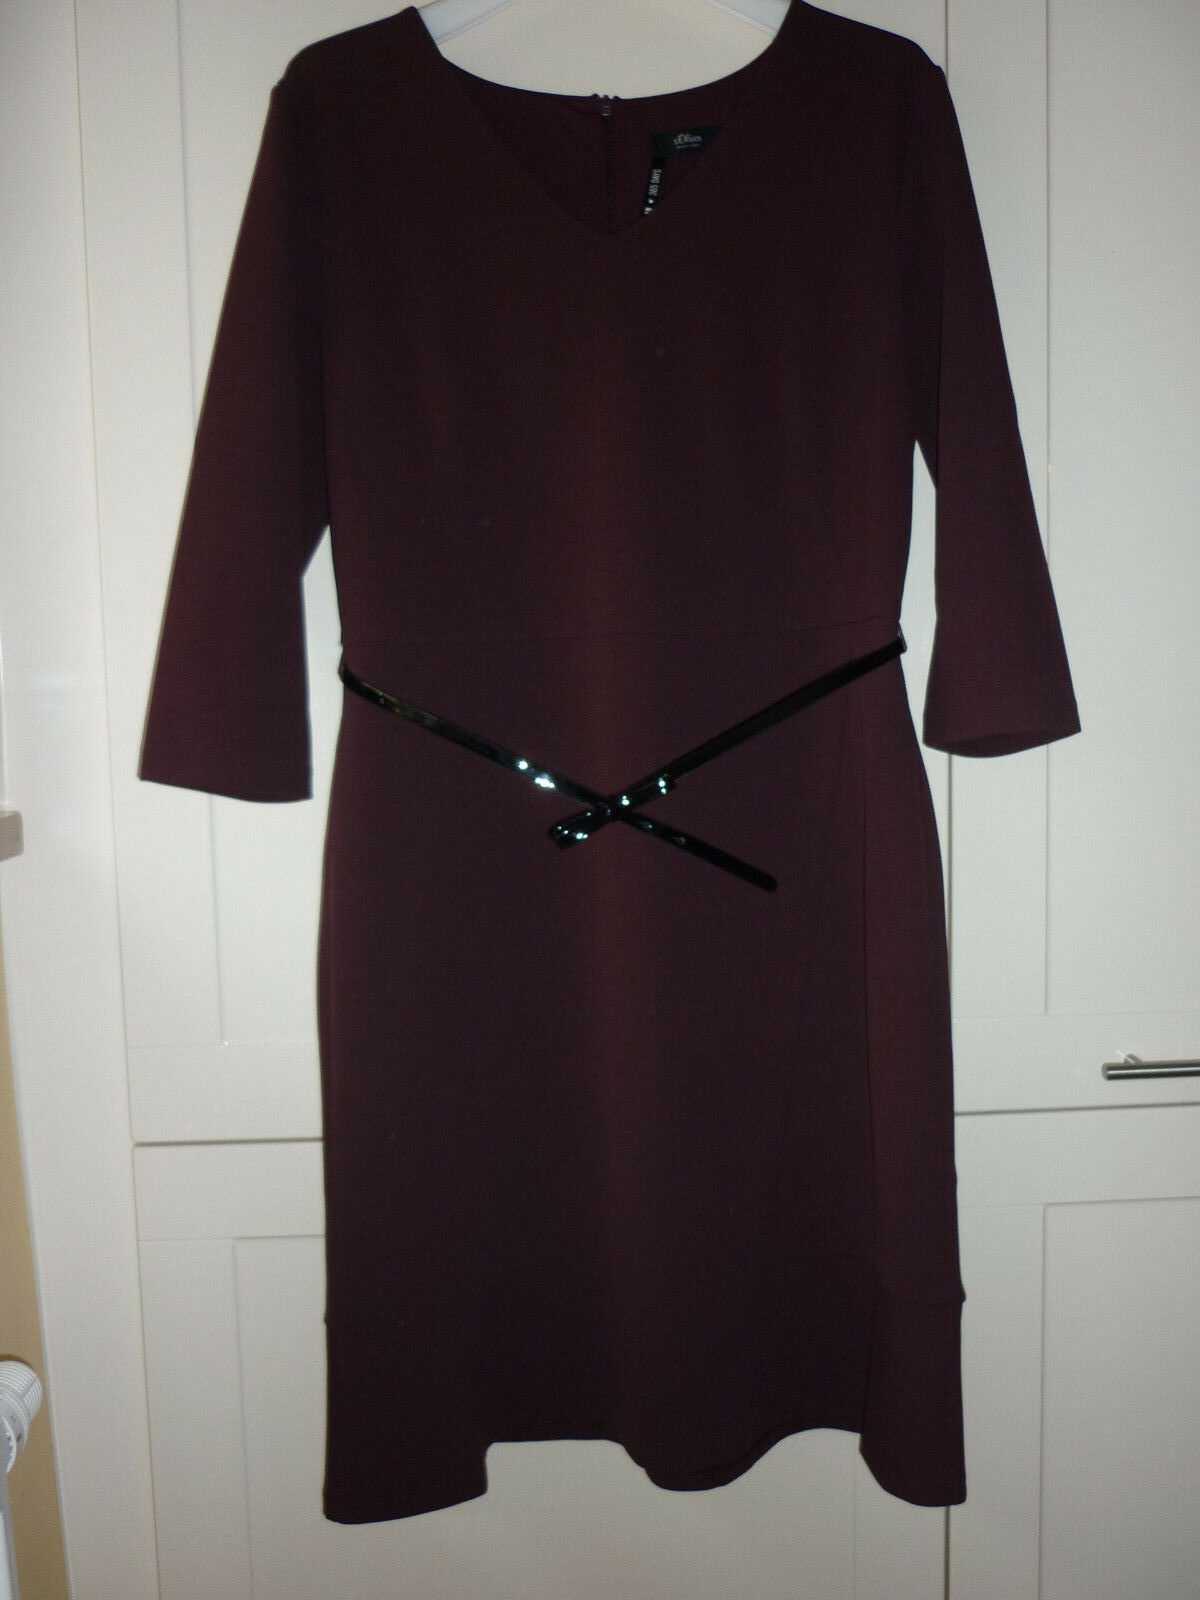 Kleid s.Oliver rot weinrot schwarz lack Etuikleid Gr. 42 40